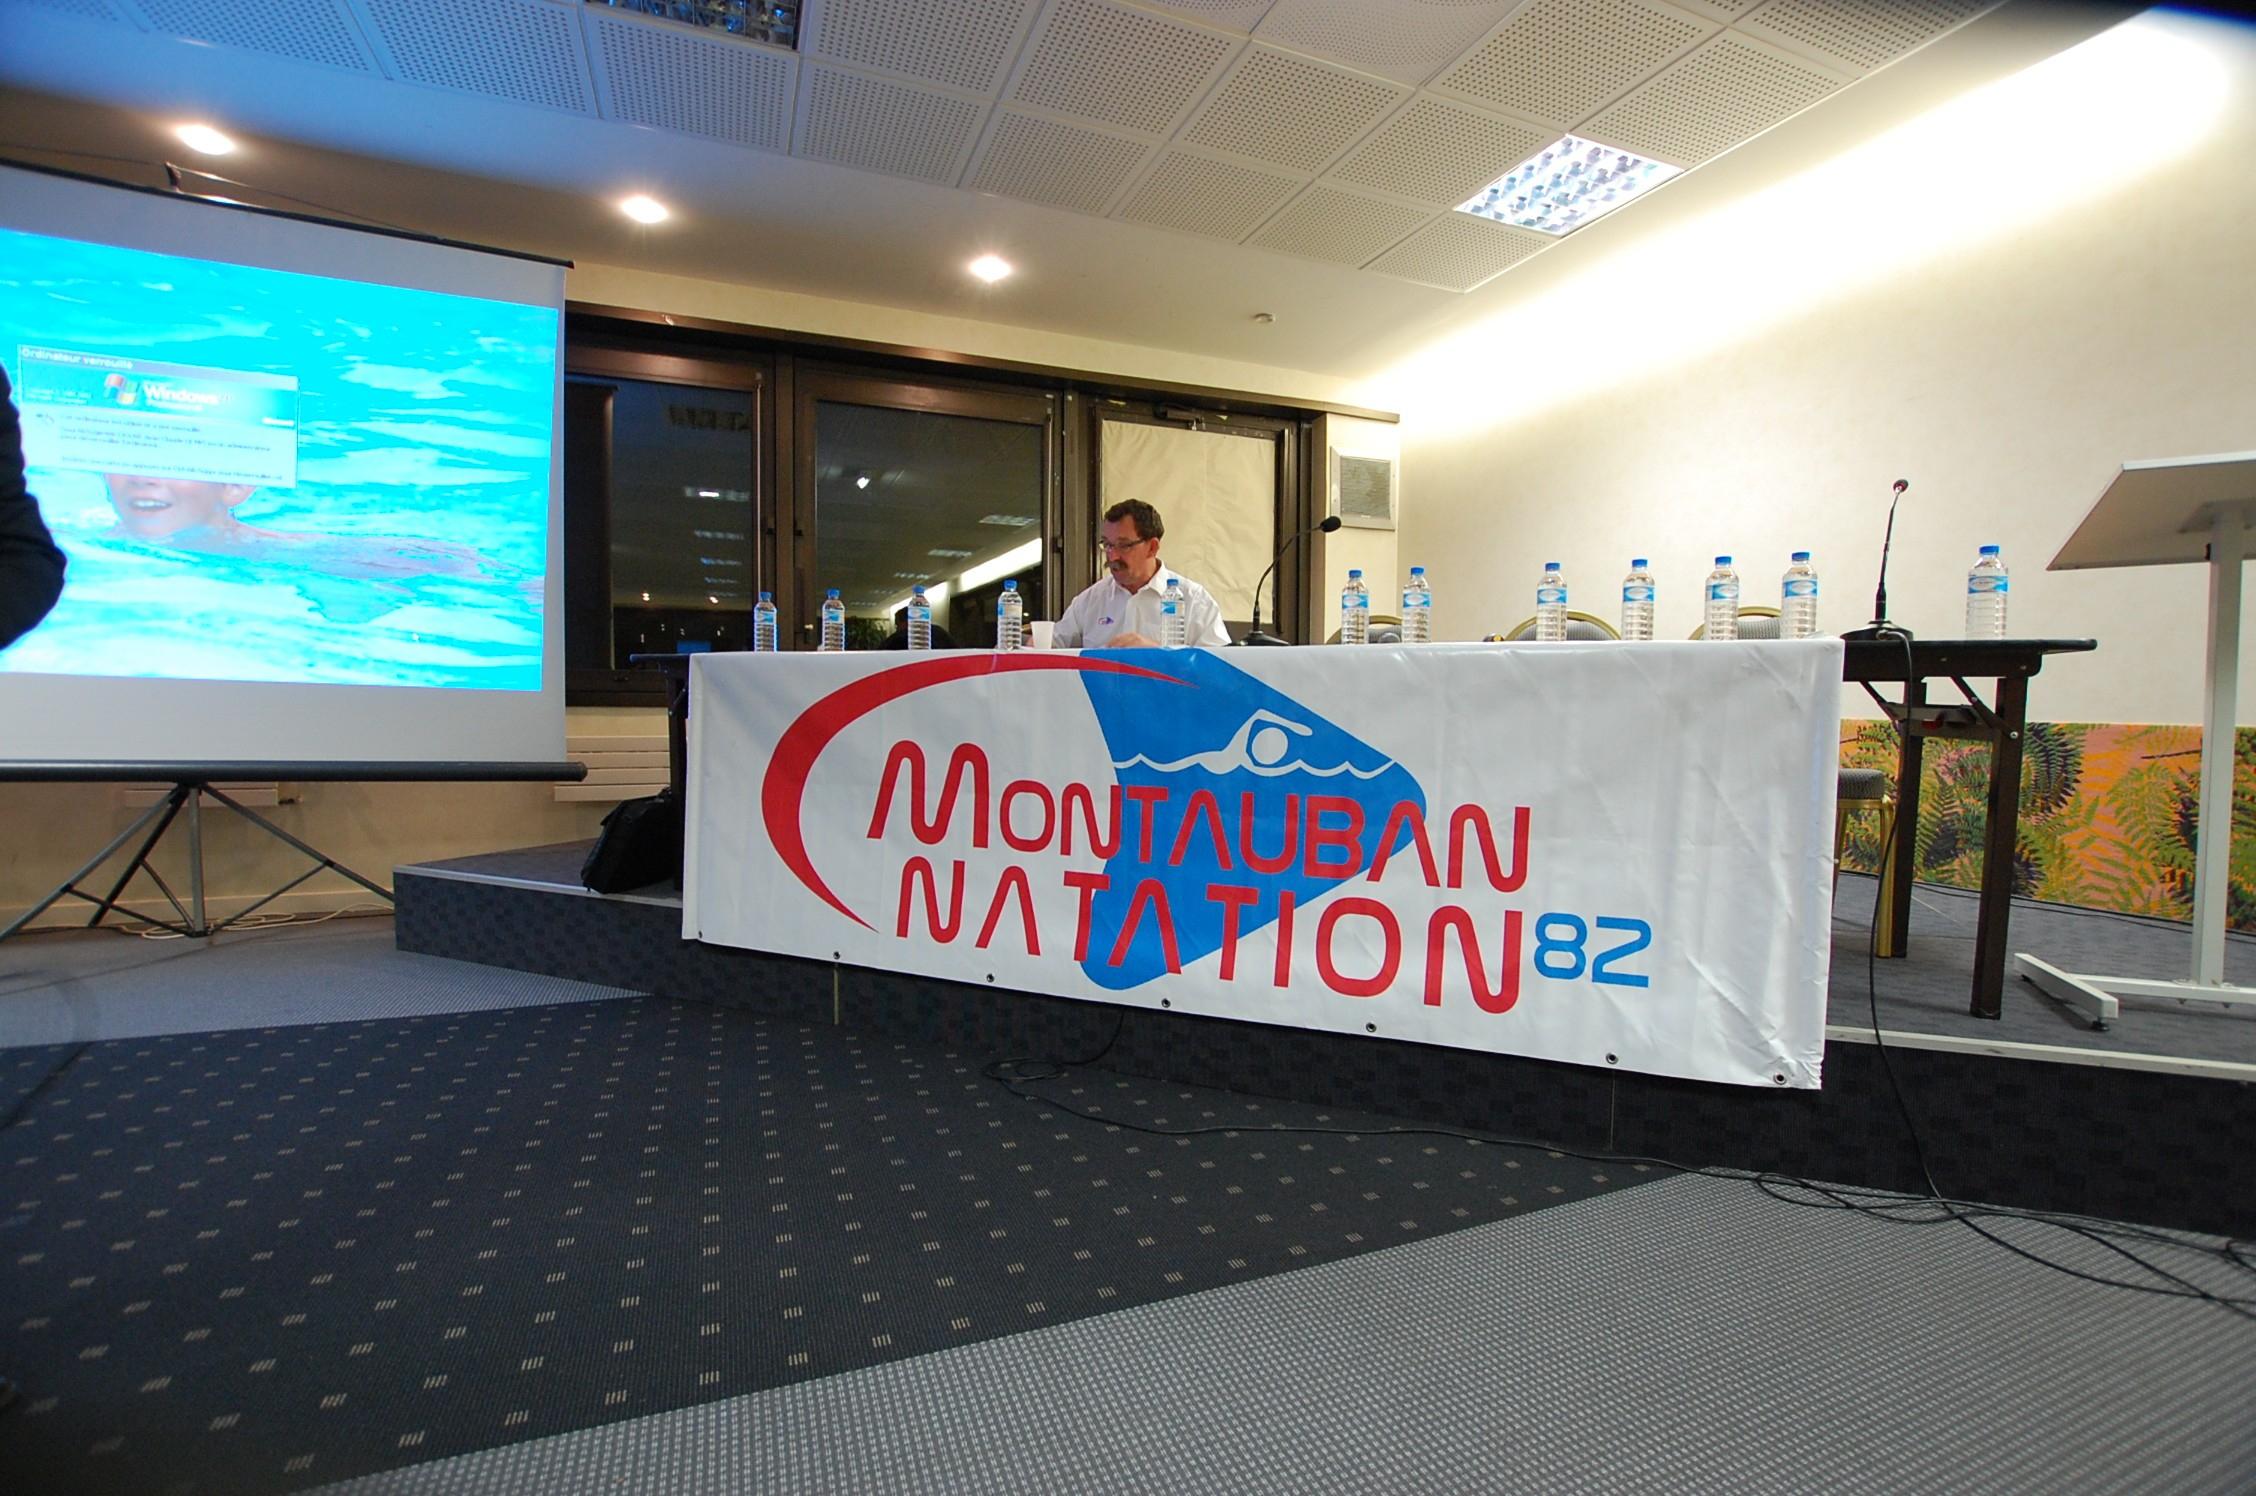 Montauban Natation - La Rentrée Du Mn82 // Abcnatation encequiconcerne Piscine Ingreo Montauban